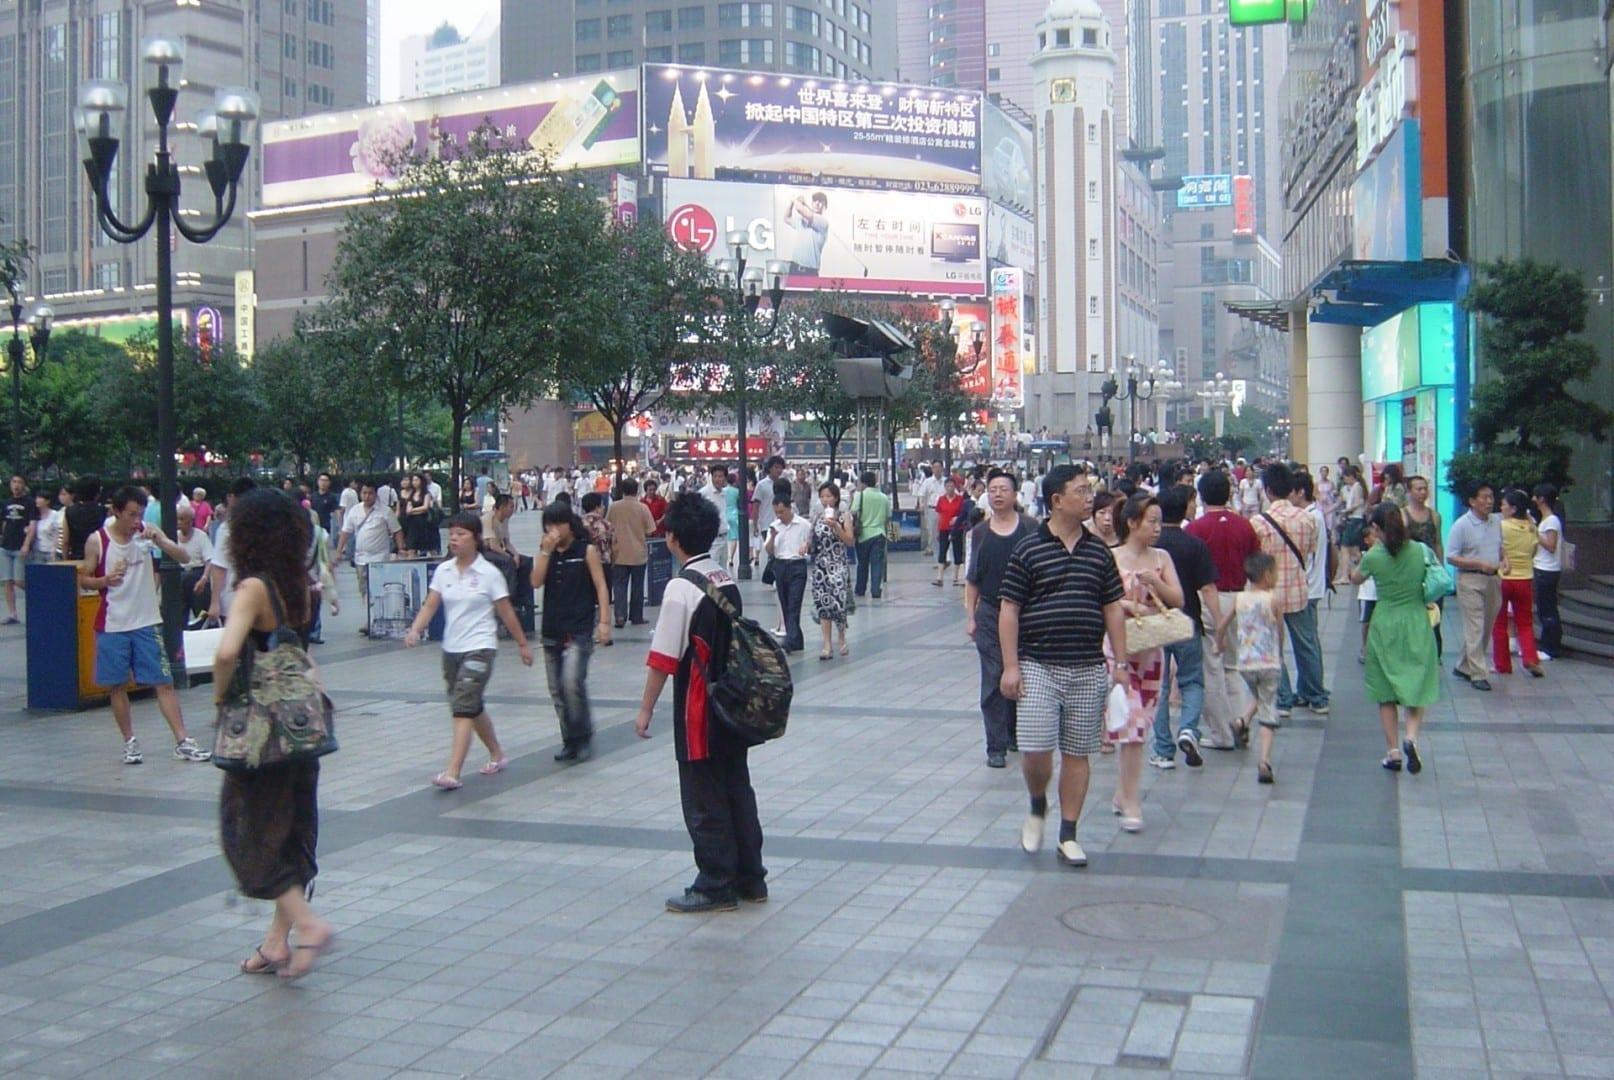 El centro comercial peatonal en el centro de Jiefangbei Chongqing China